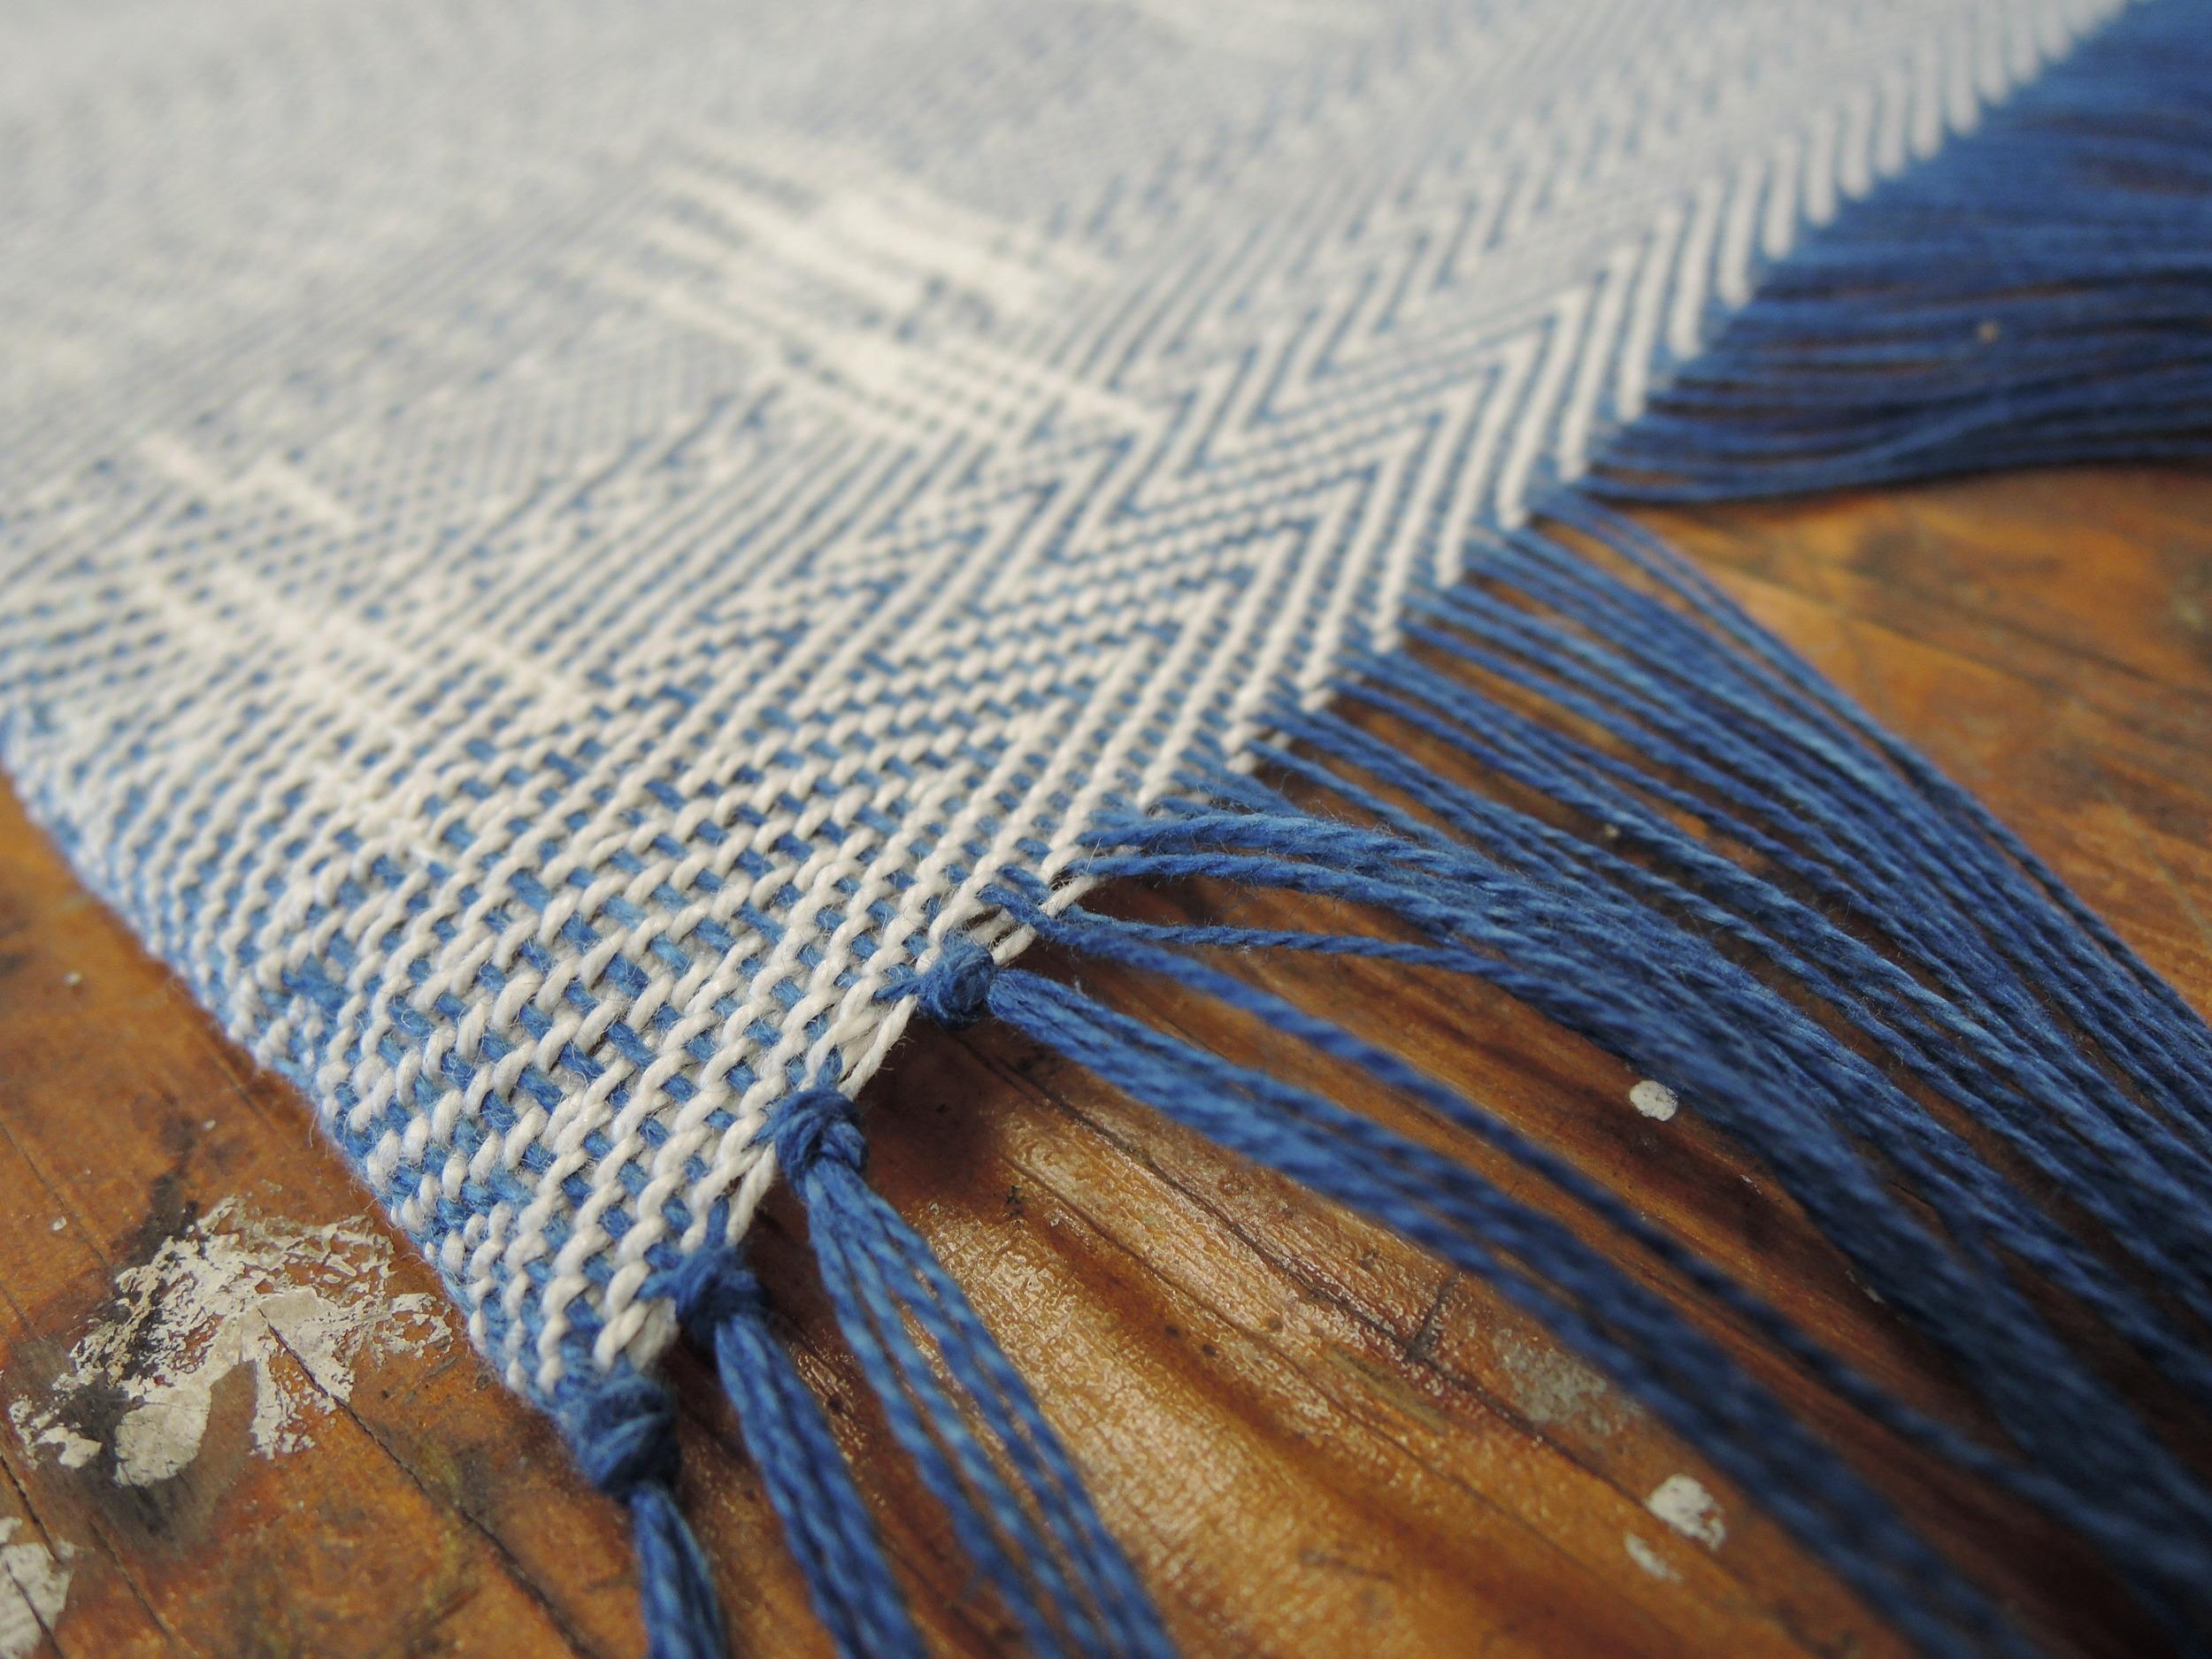 Carefully tying knots to finish the edges.